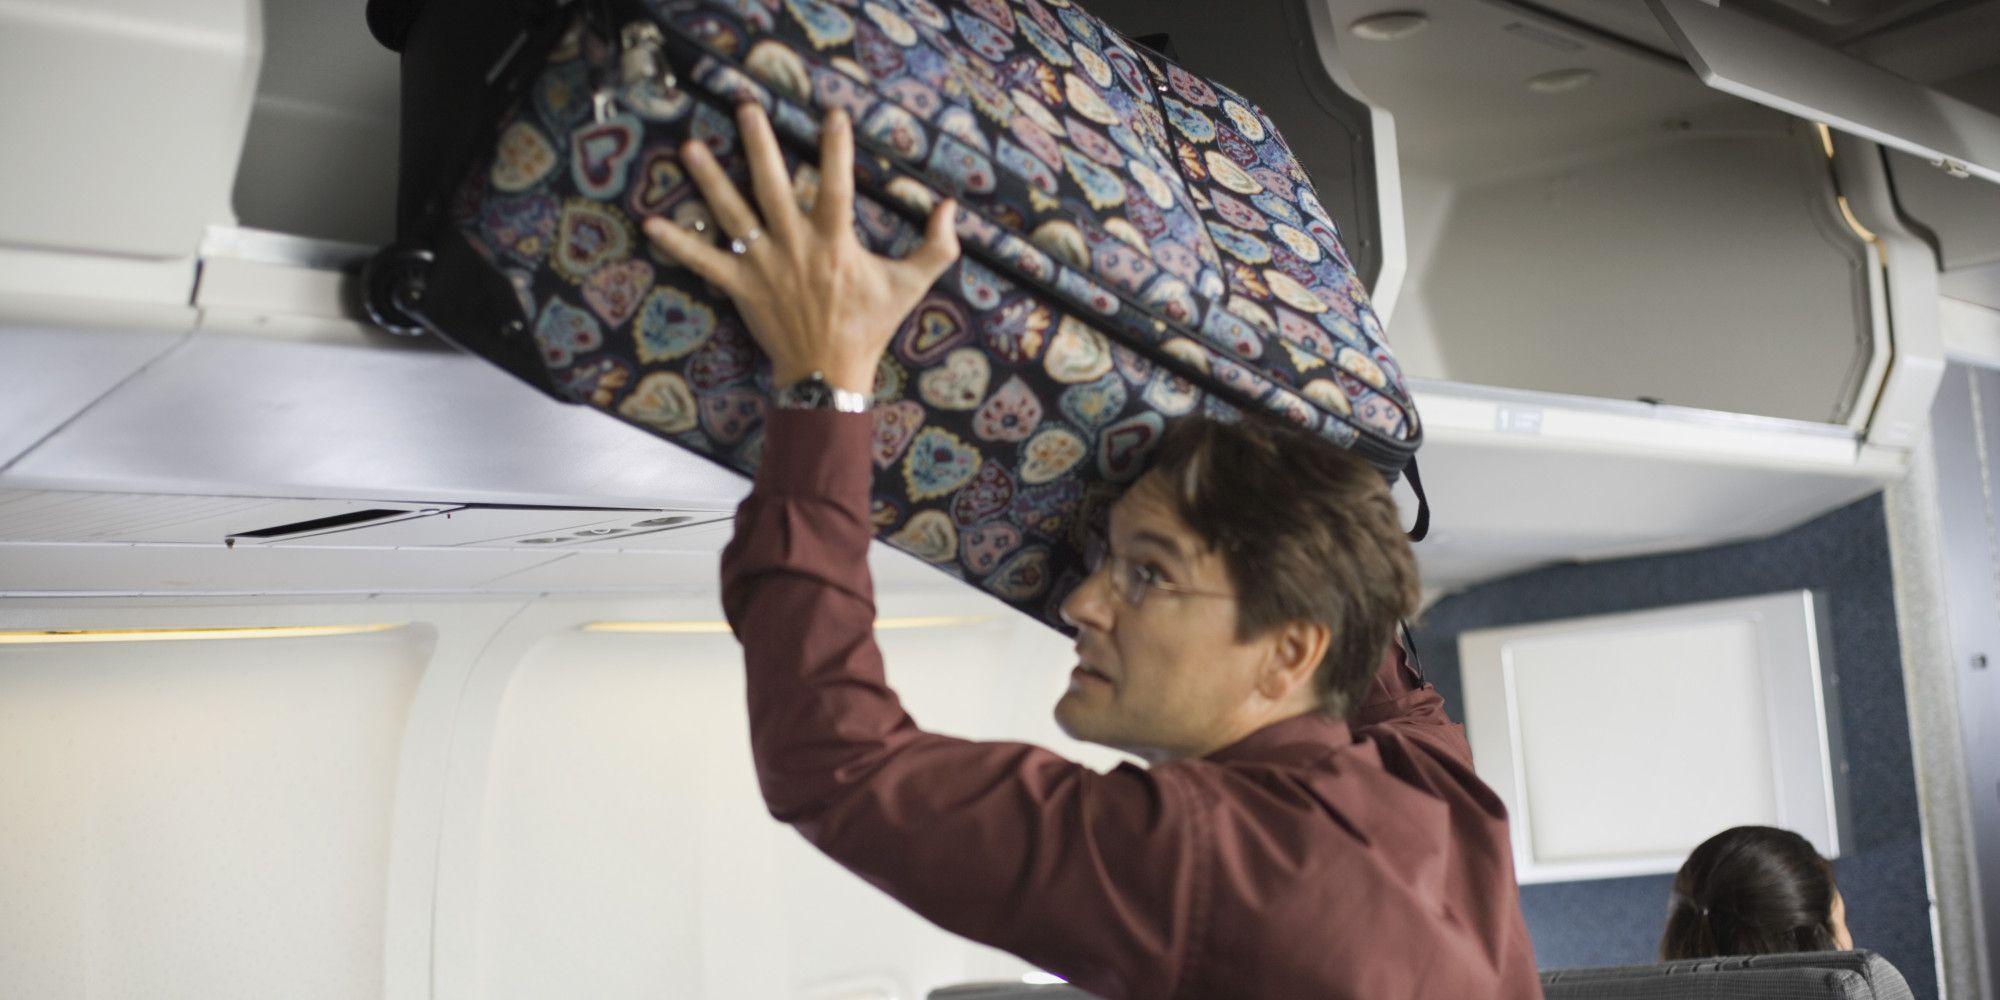 Loose Bat Terrorizes Spirit Airlines Passengers MidFlight